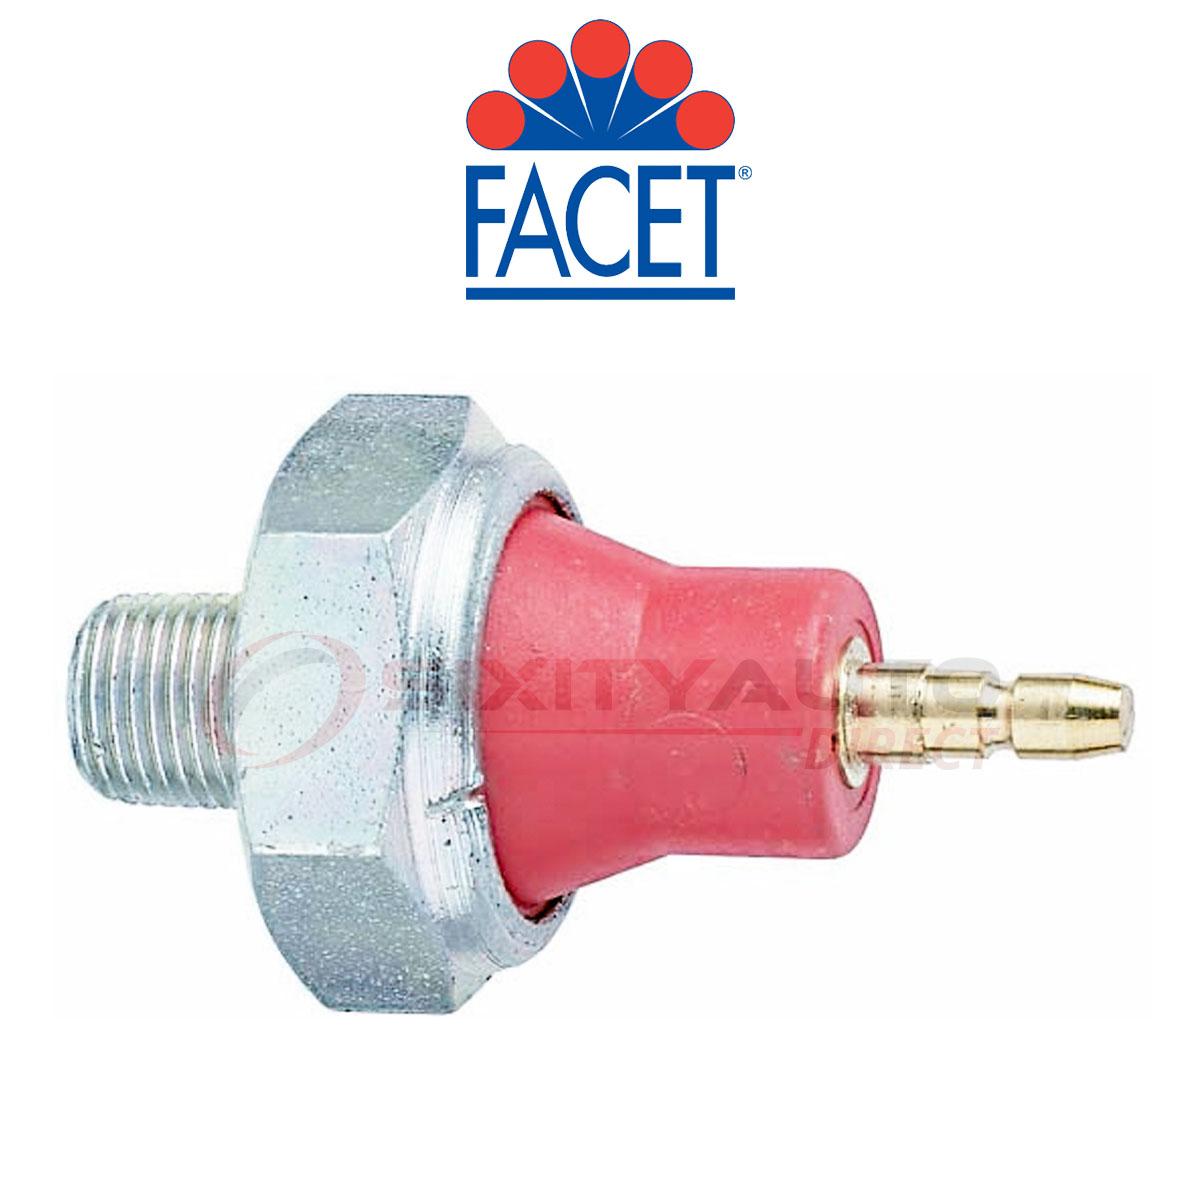 Facet Engine Oil Pressure Switch For 1992-1994 Acura Vigor